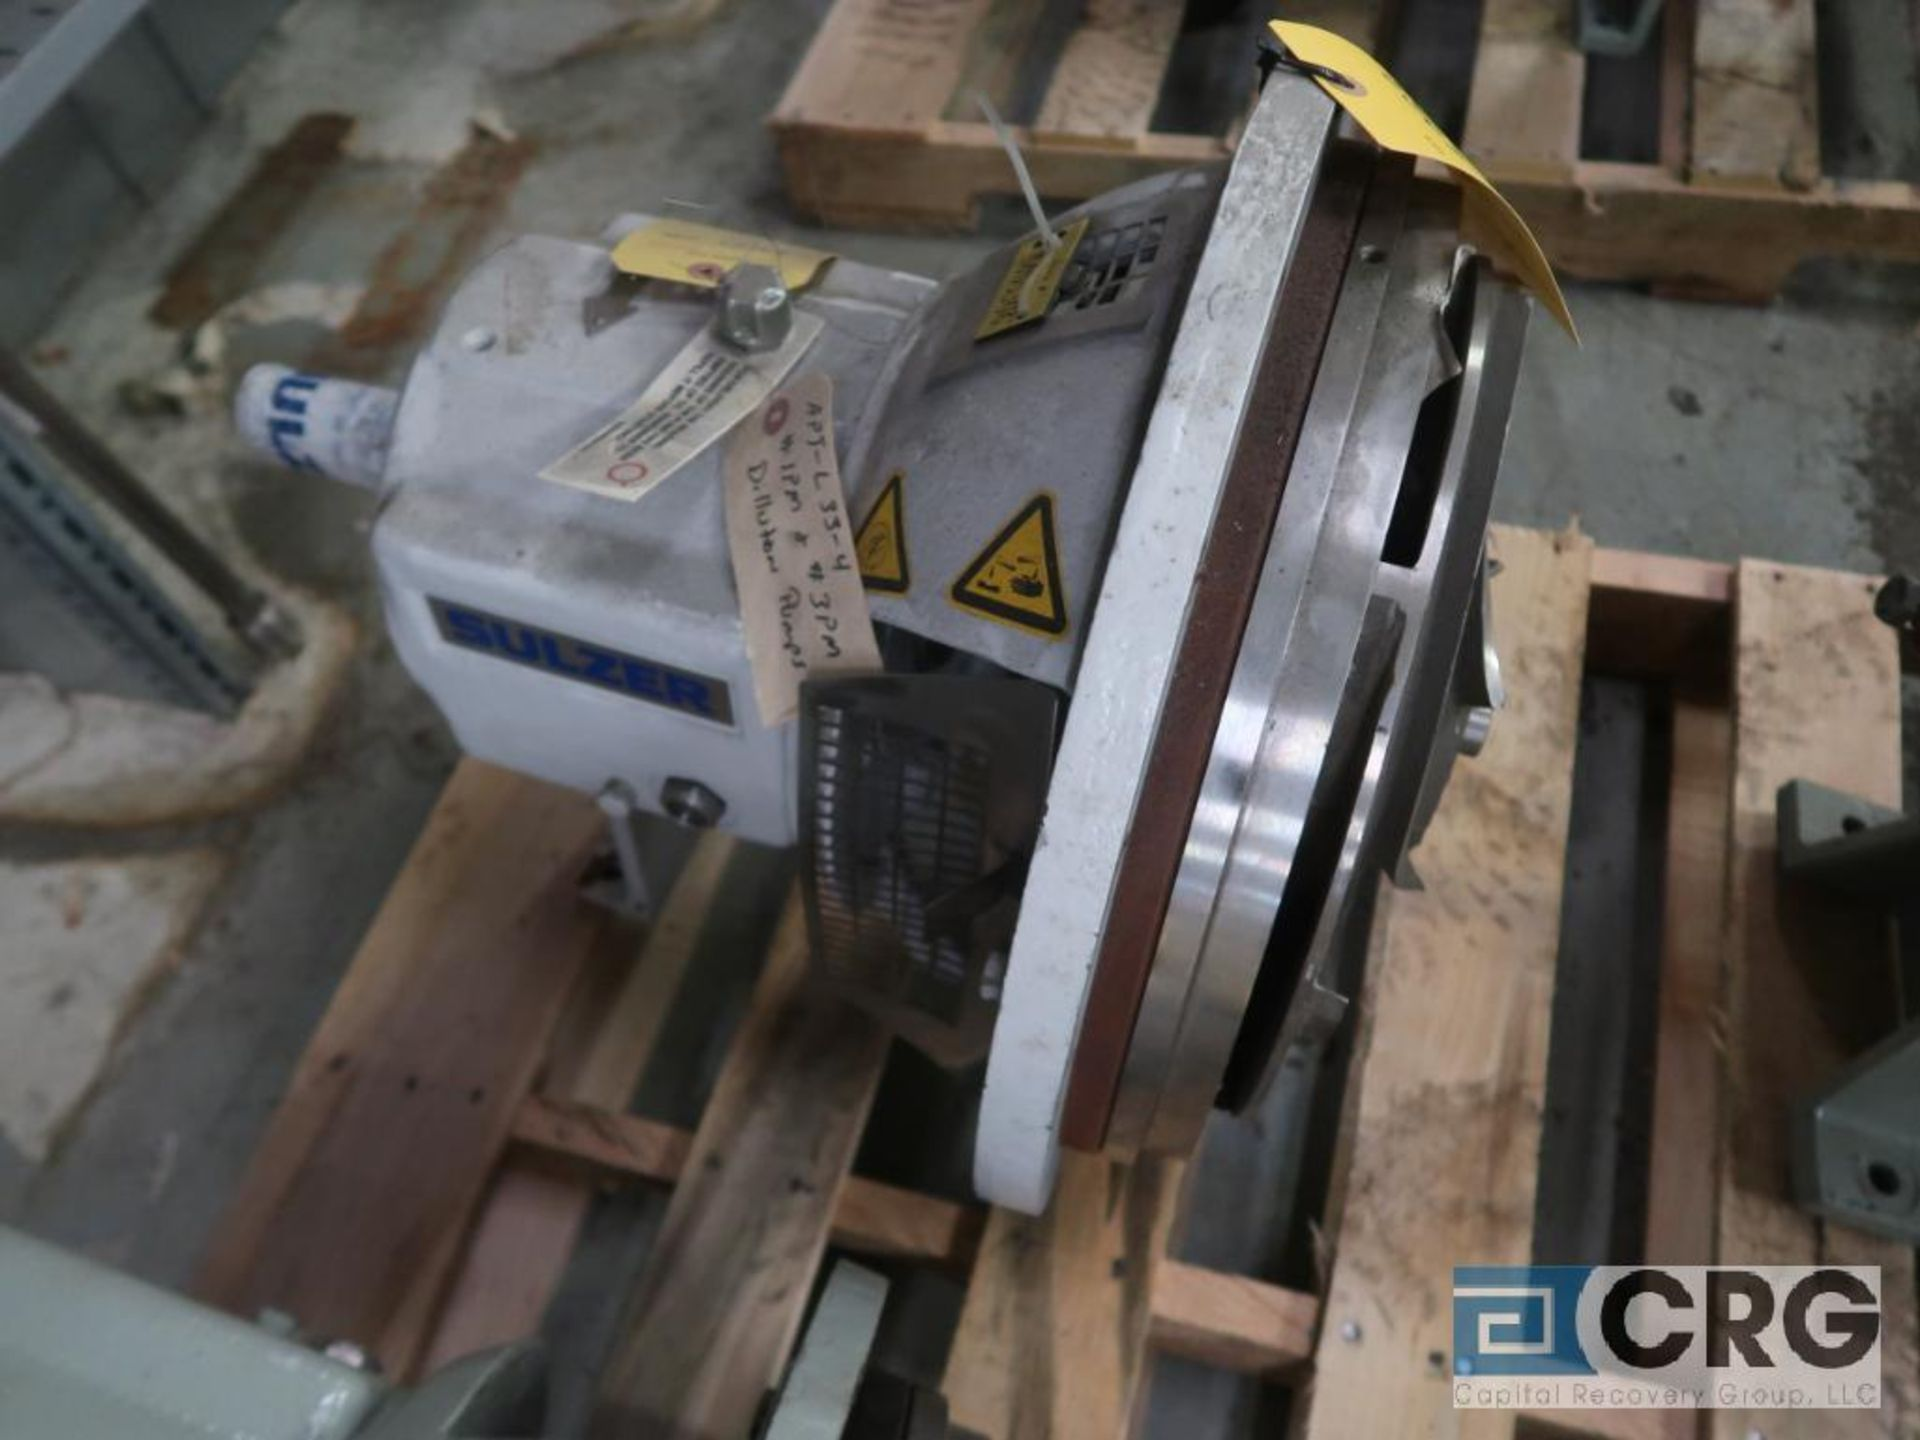 Sulzer APT 33-4 process pump, 10 x 8 x 13 (Basement Stores)